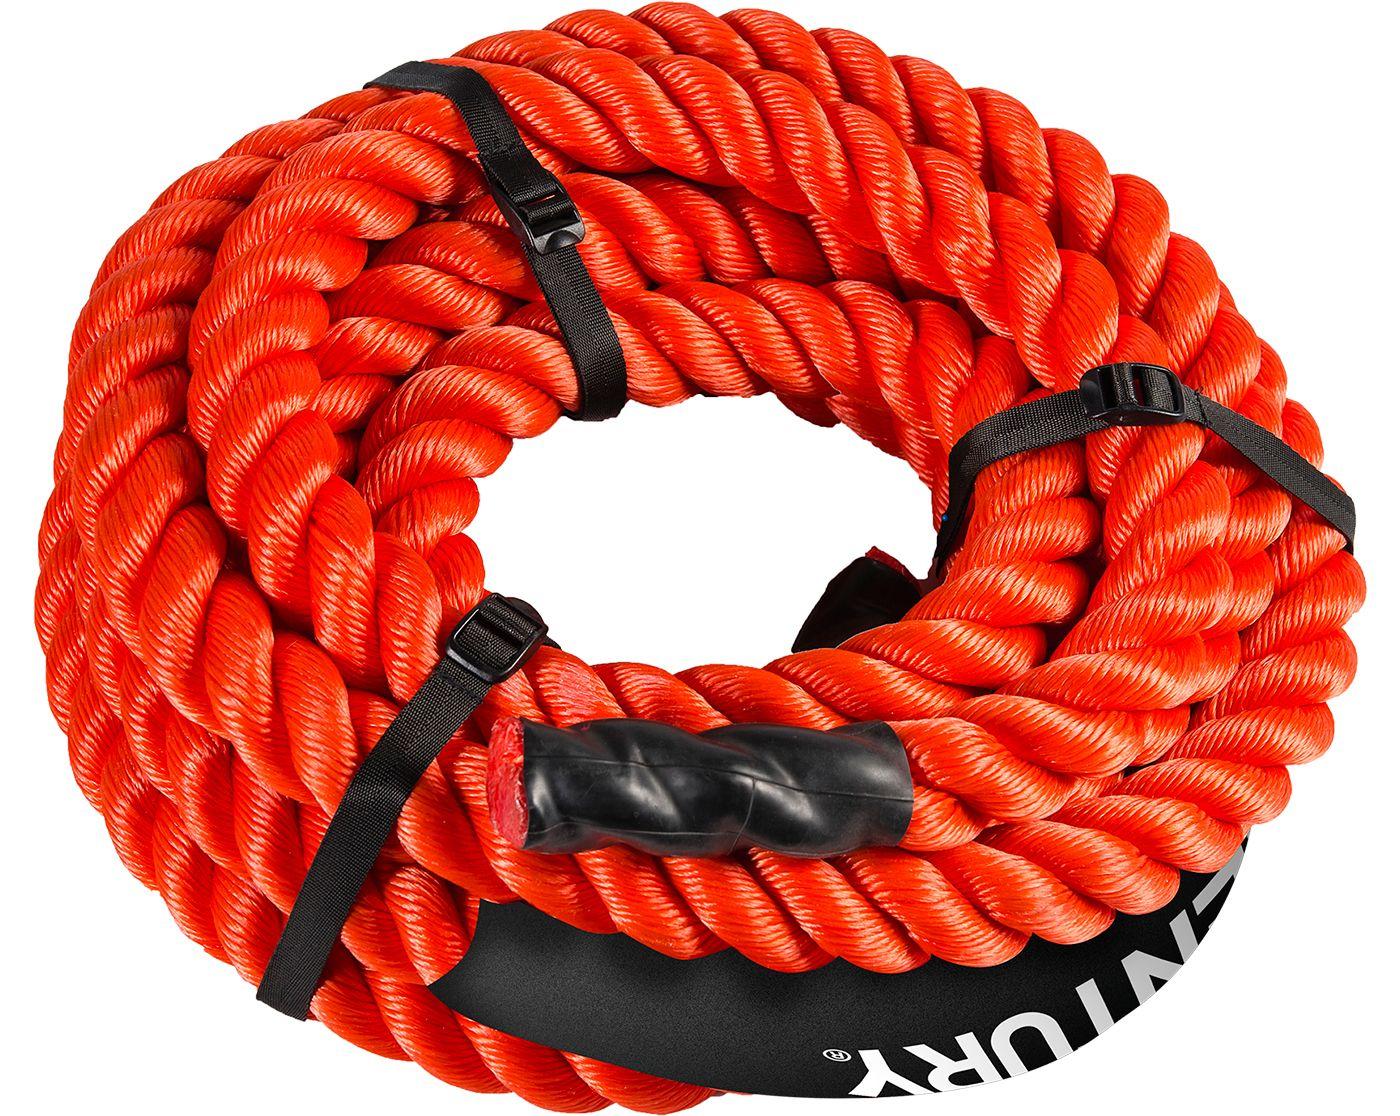 Century 30' Challenge Rope